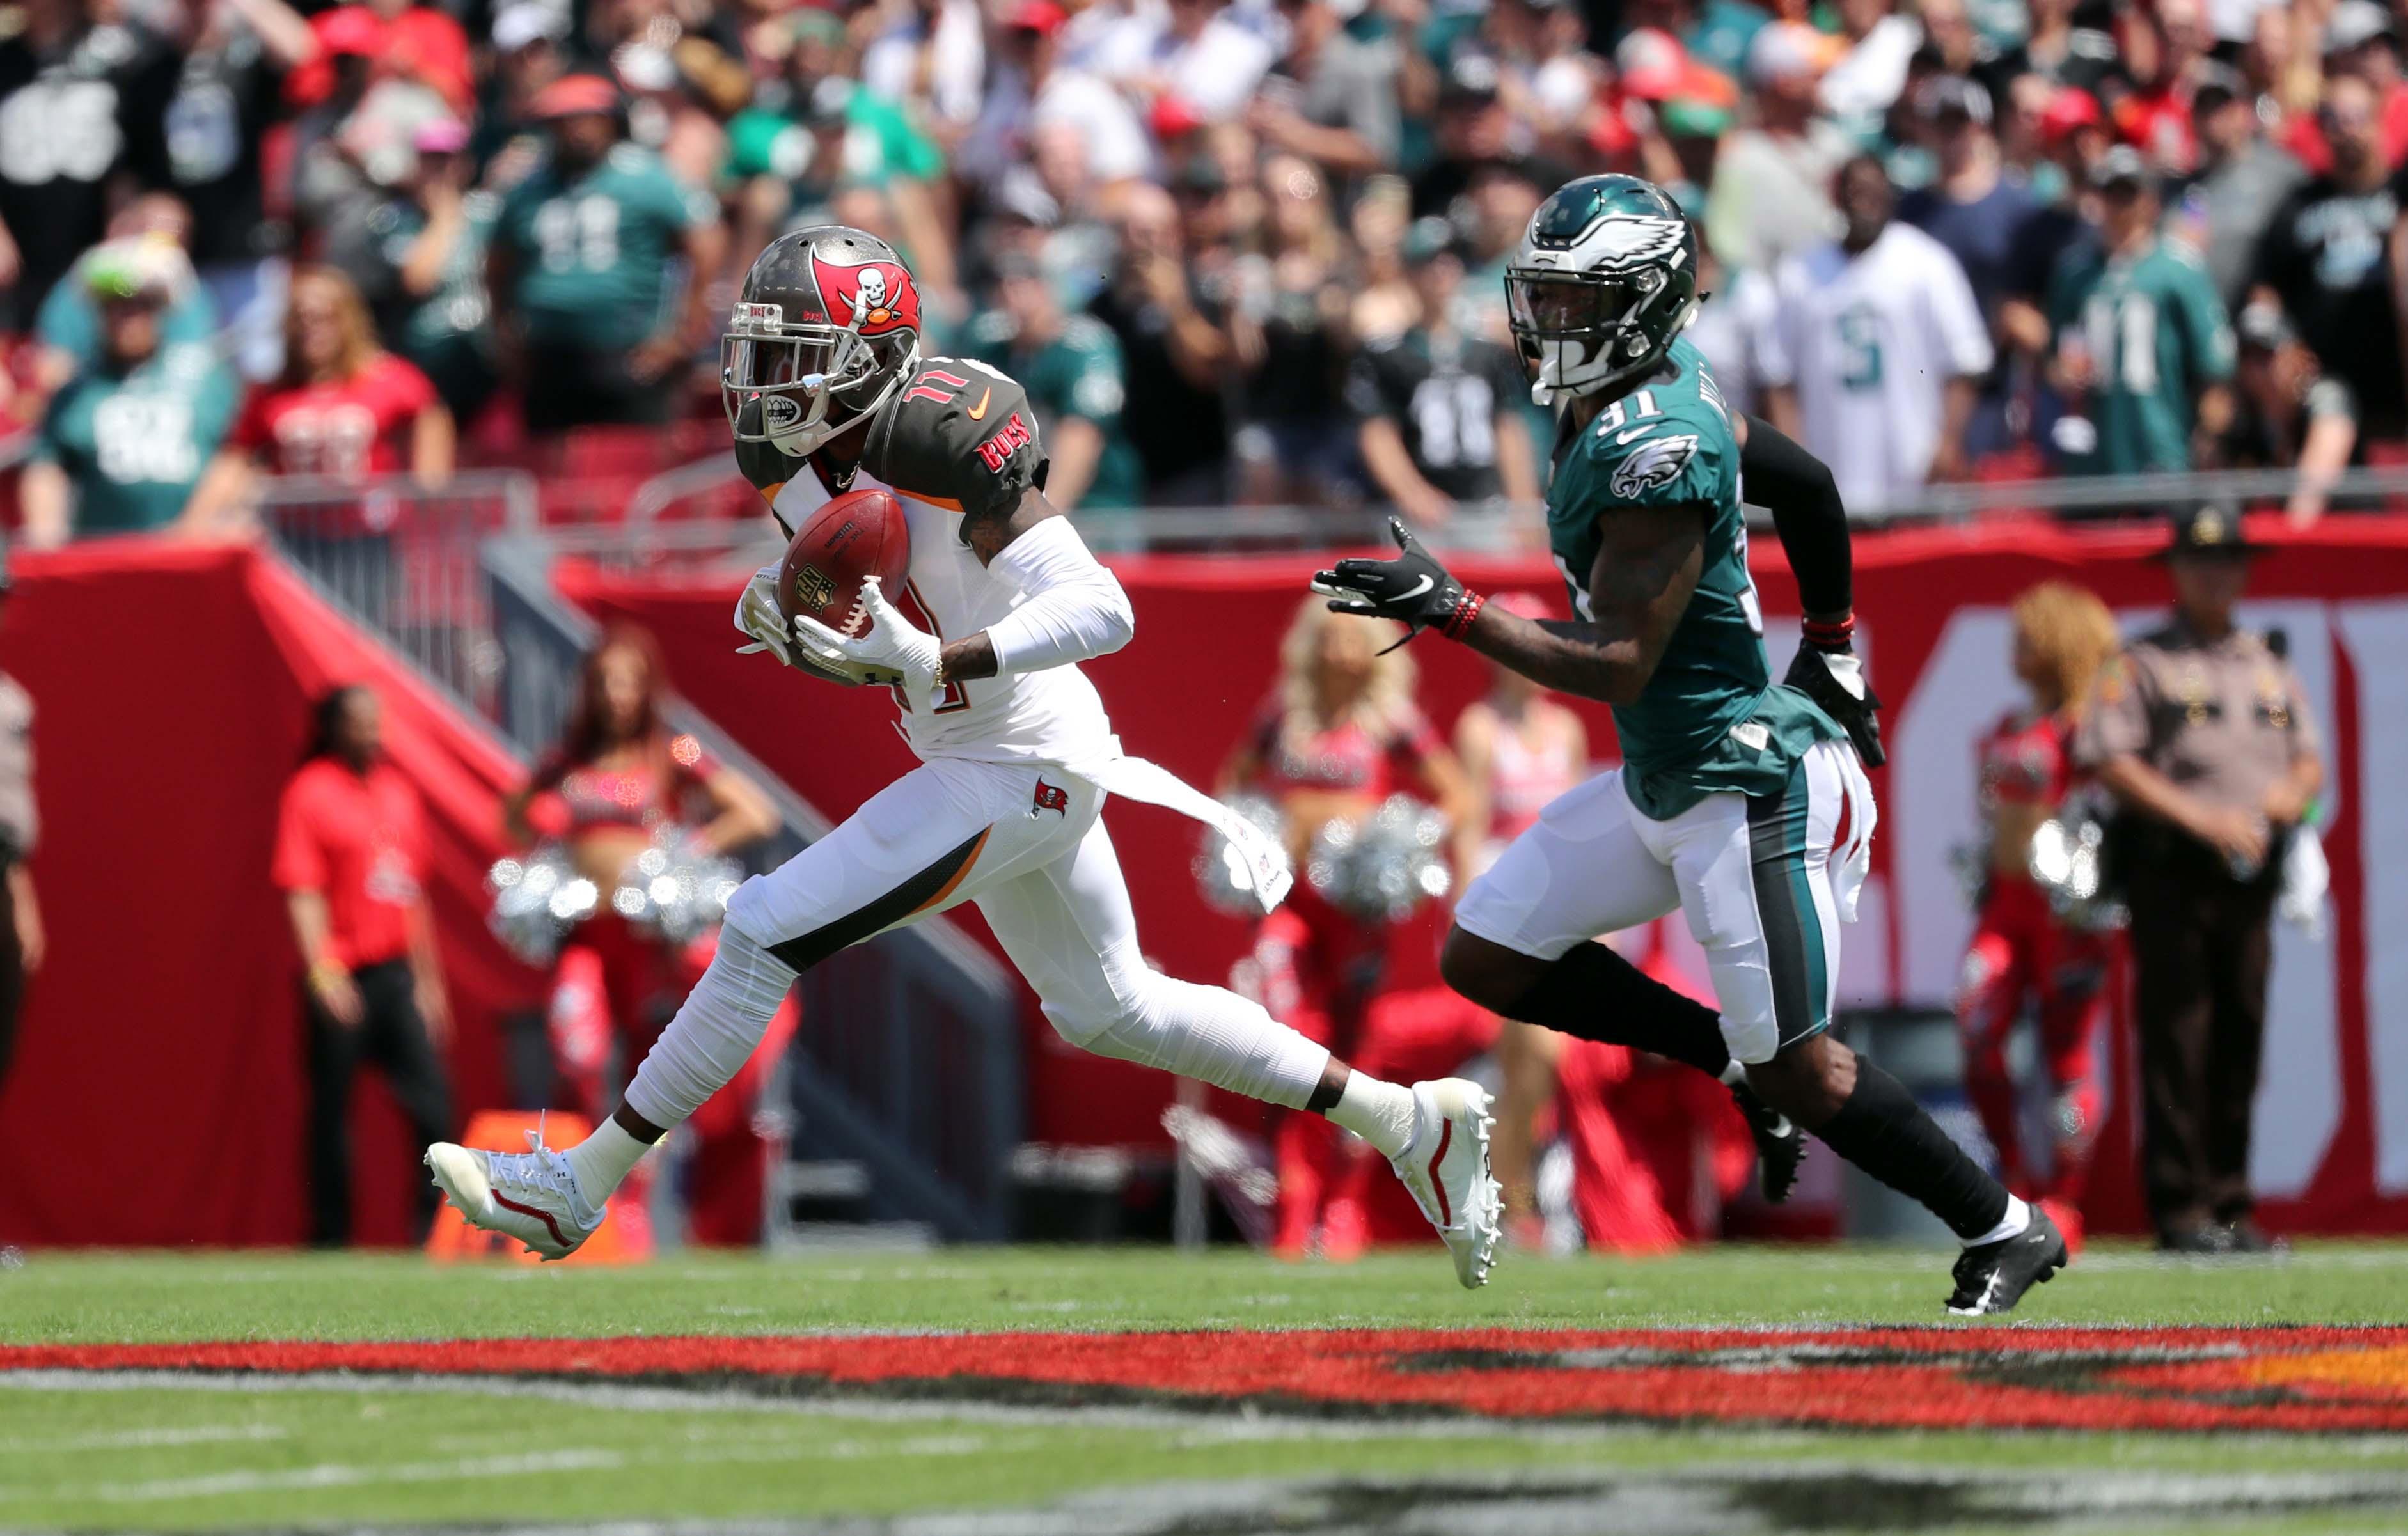 Eagles NFL trade rumors: Latest on DeSean Jackson